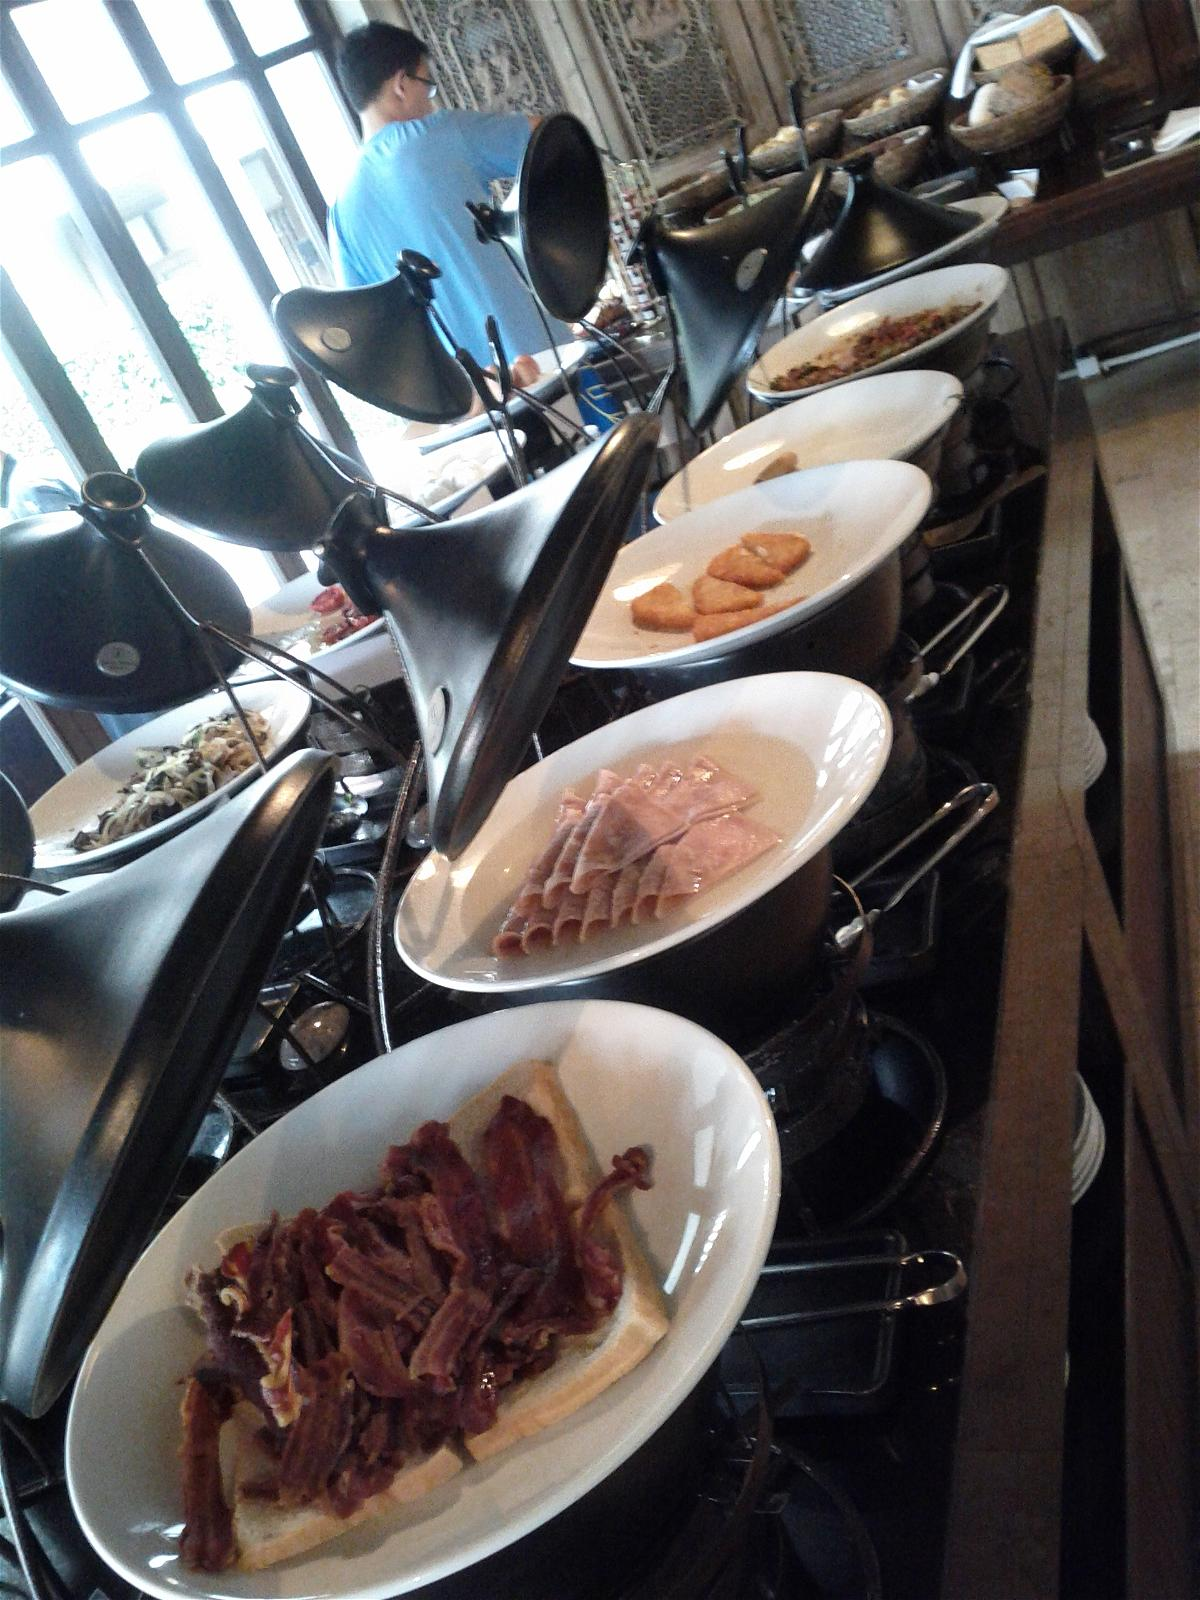 le-meridien-koh-samui-resort-spa-resort-breakfast-hot-items-continues